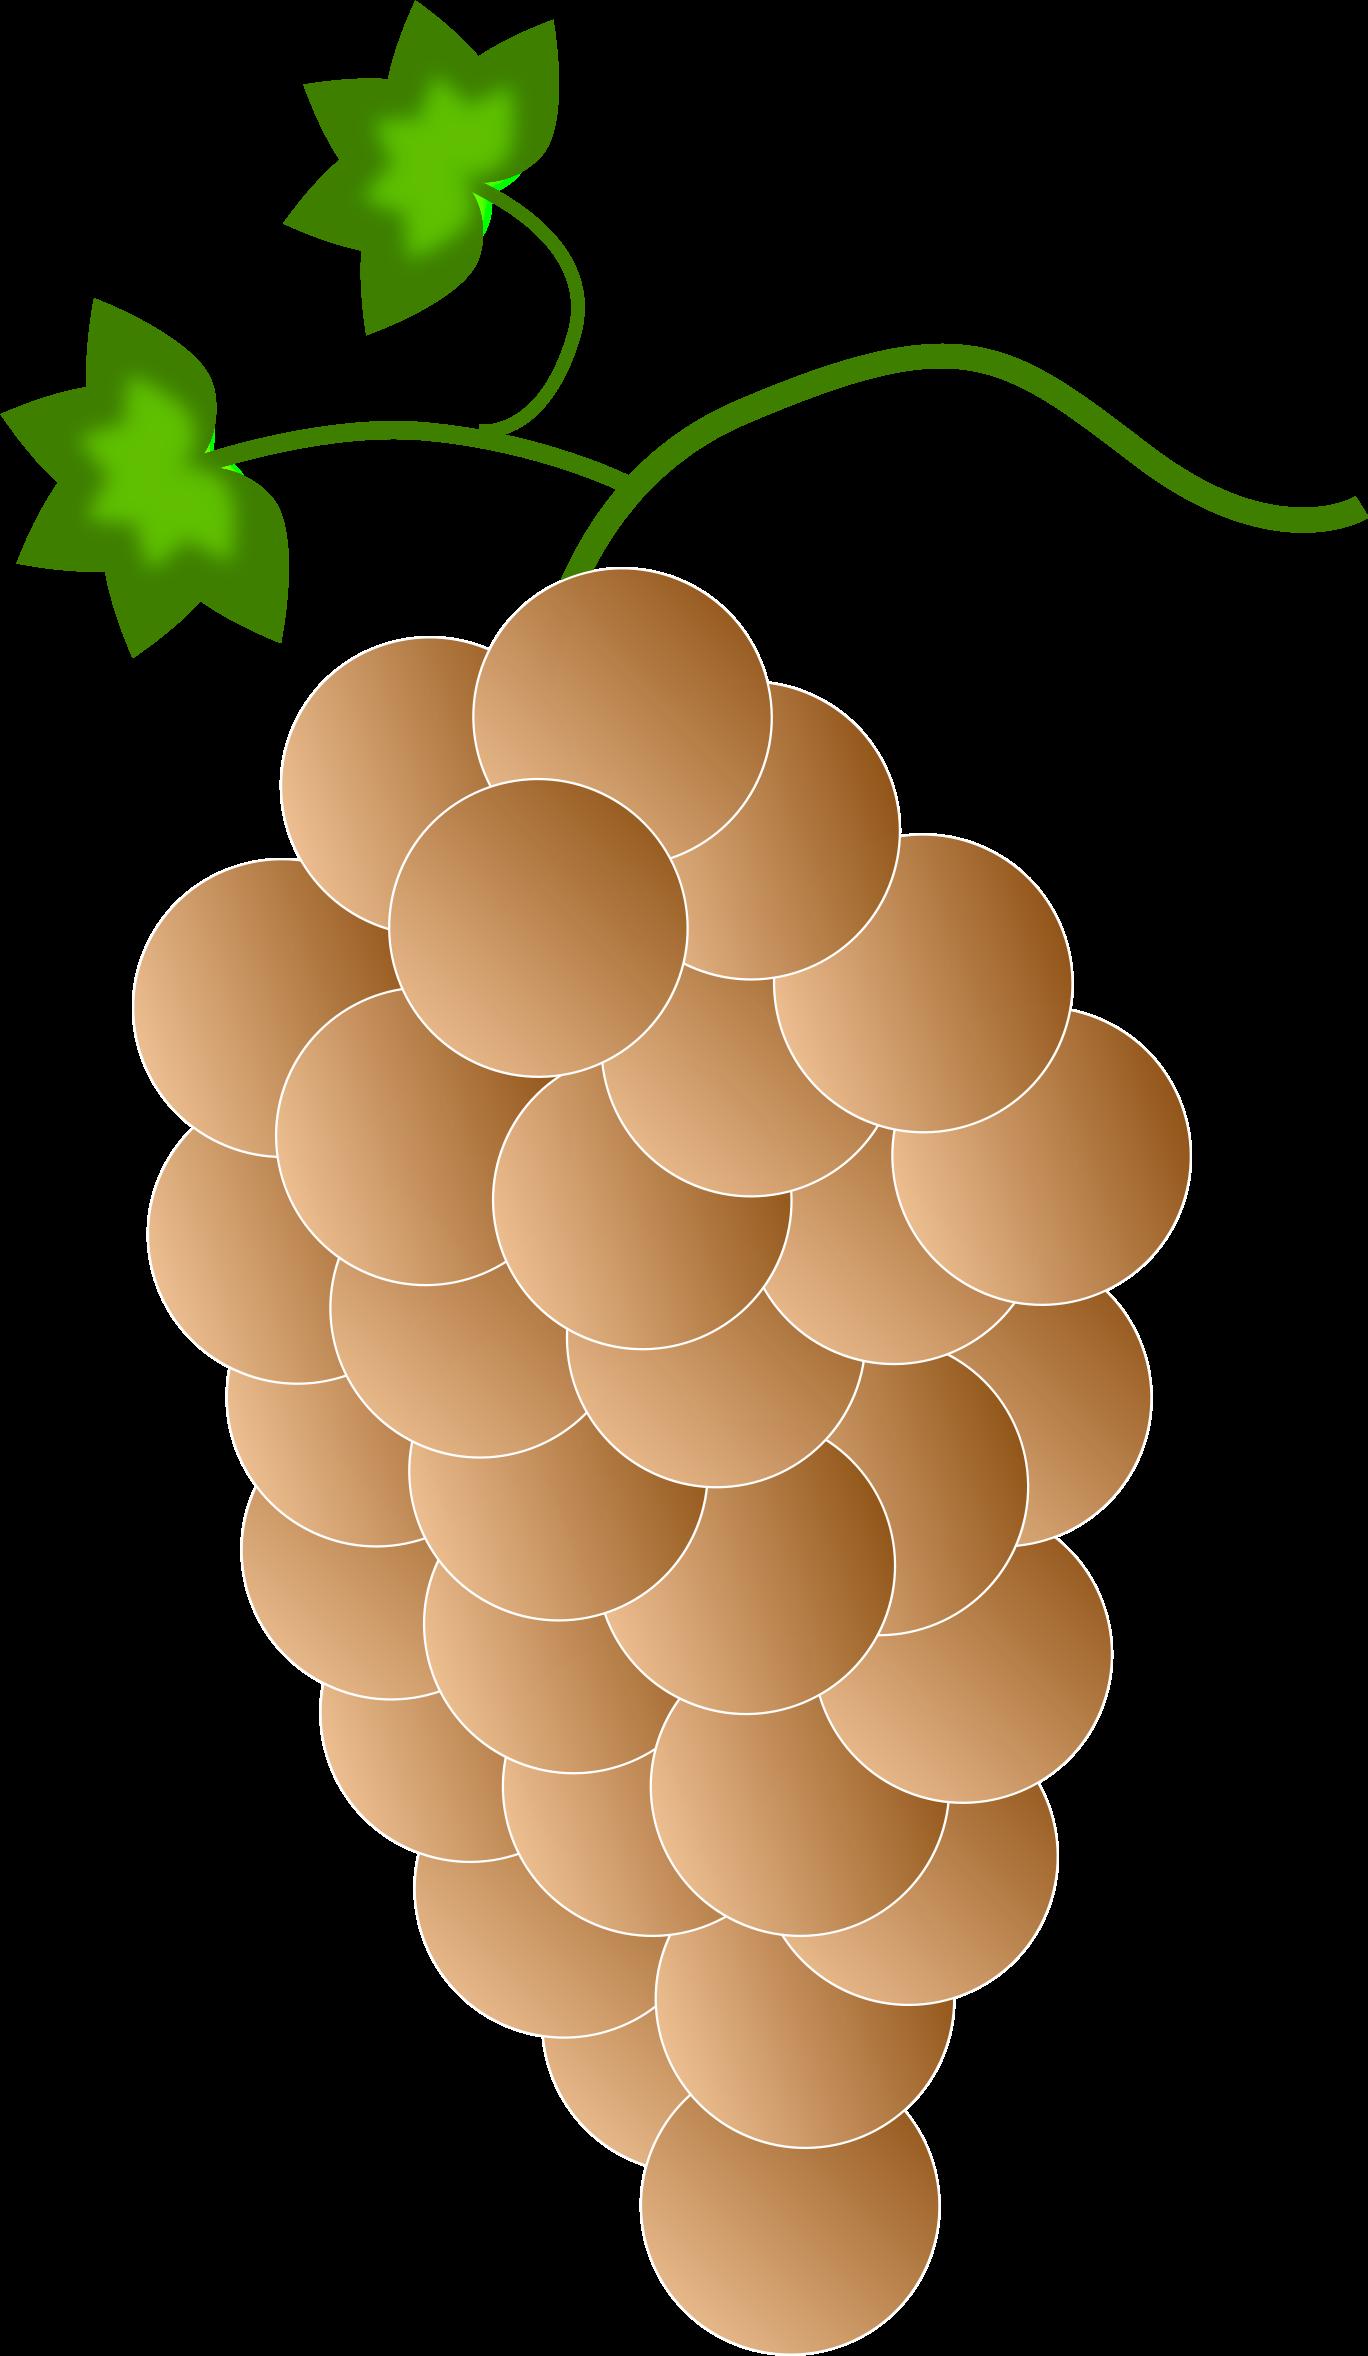 Orange grapes big image. Grape clipart orenge